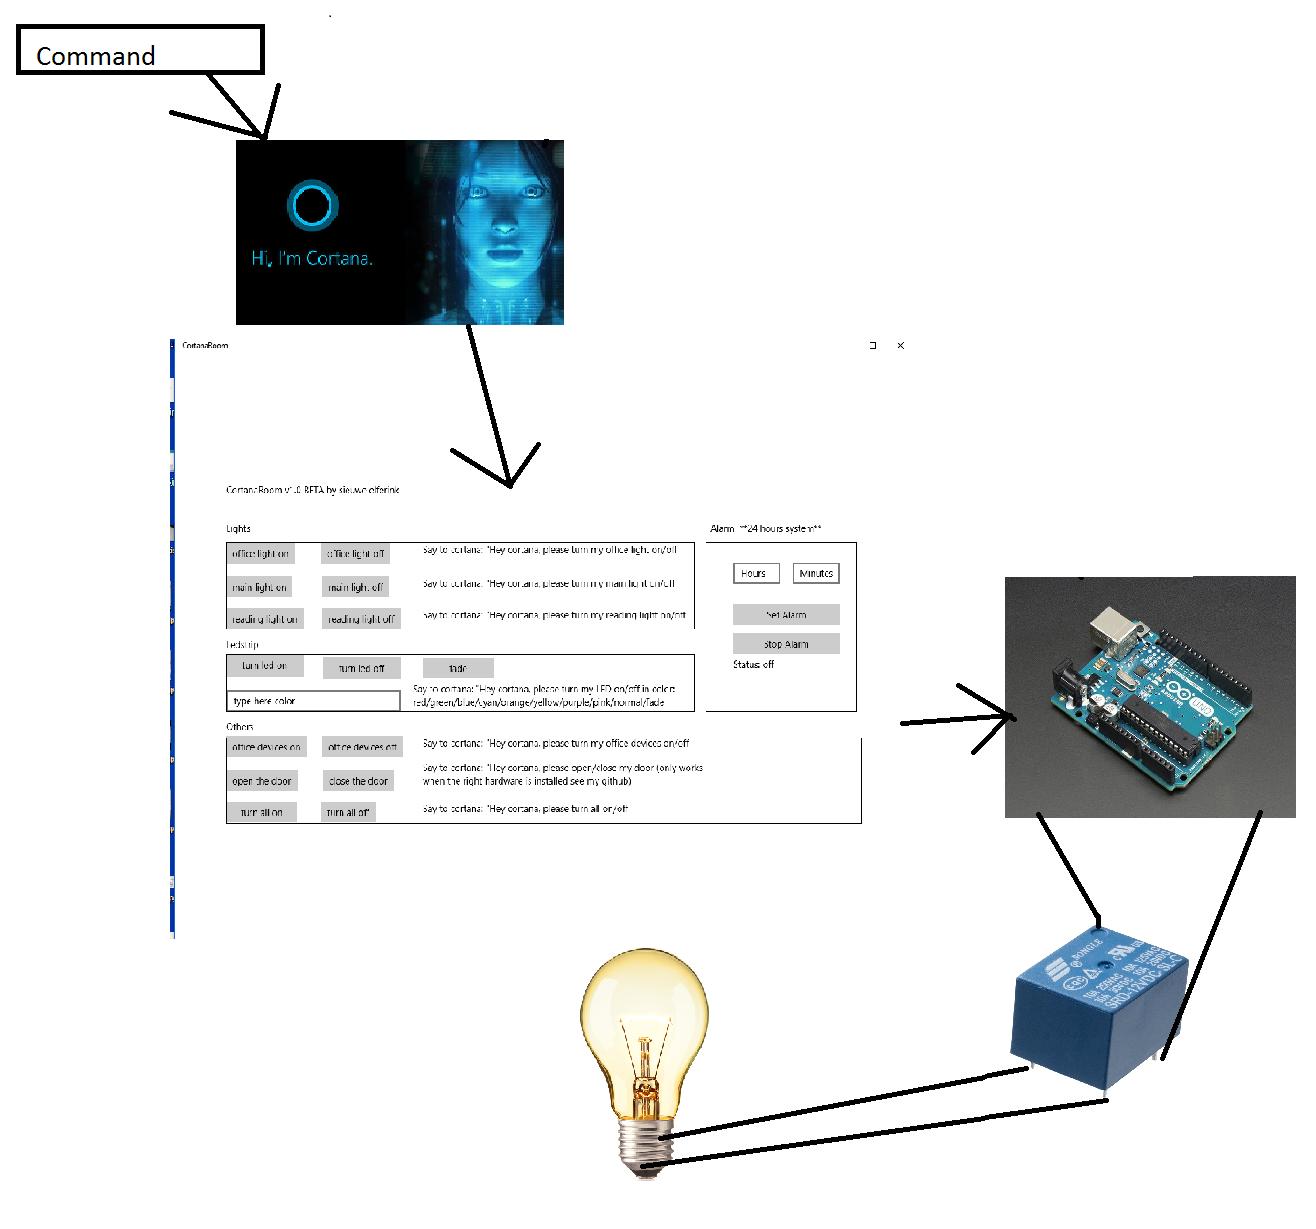 Use Cortana And Arduino To Control Rgb Led Strip Lights Strips Circuit With View Original Cortanaroomblock 4dzh3dj7yy